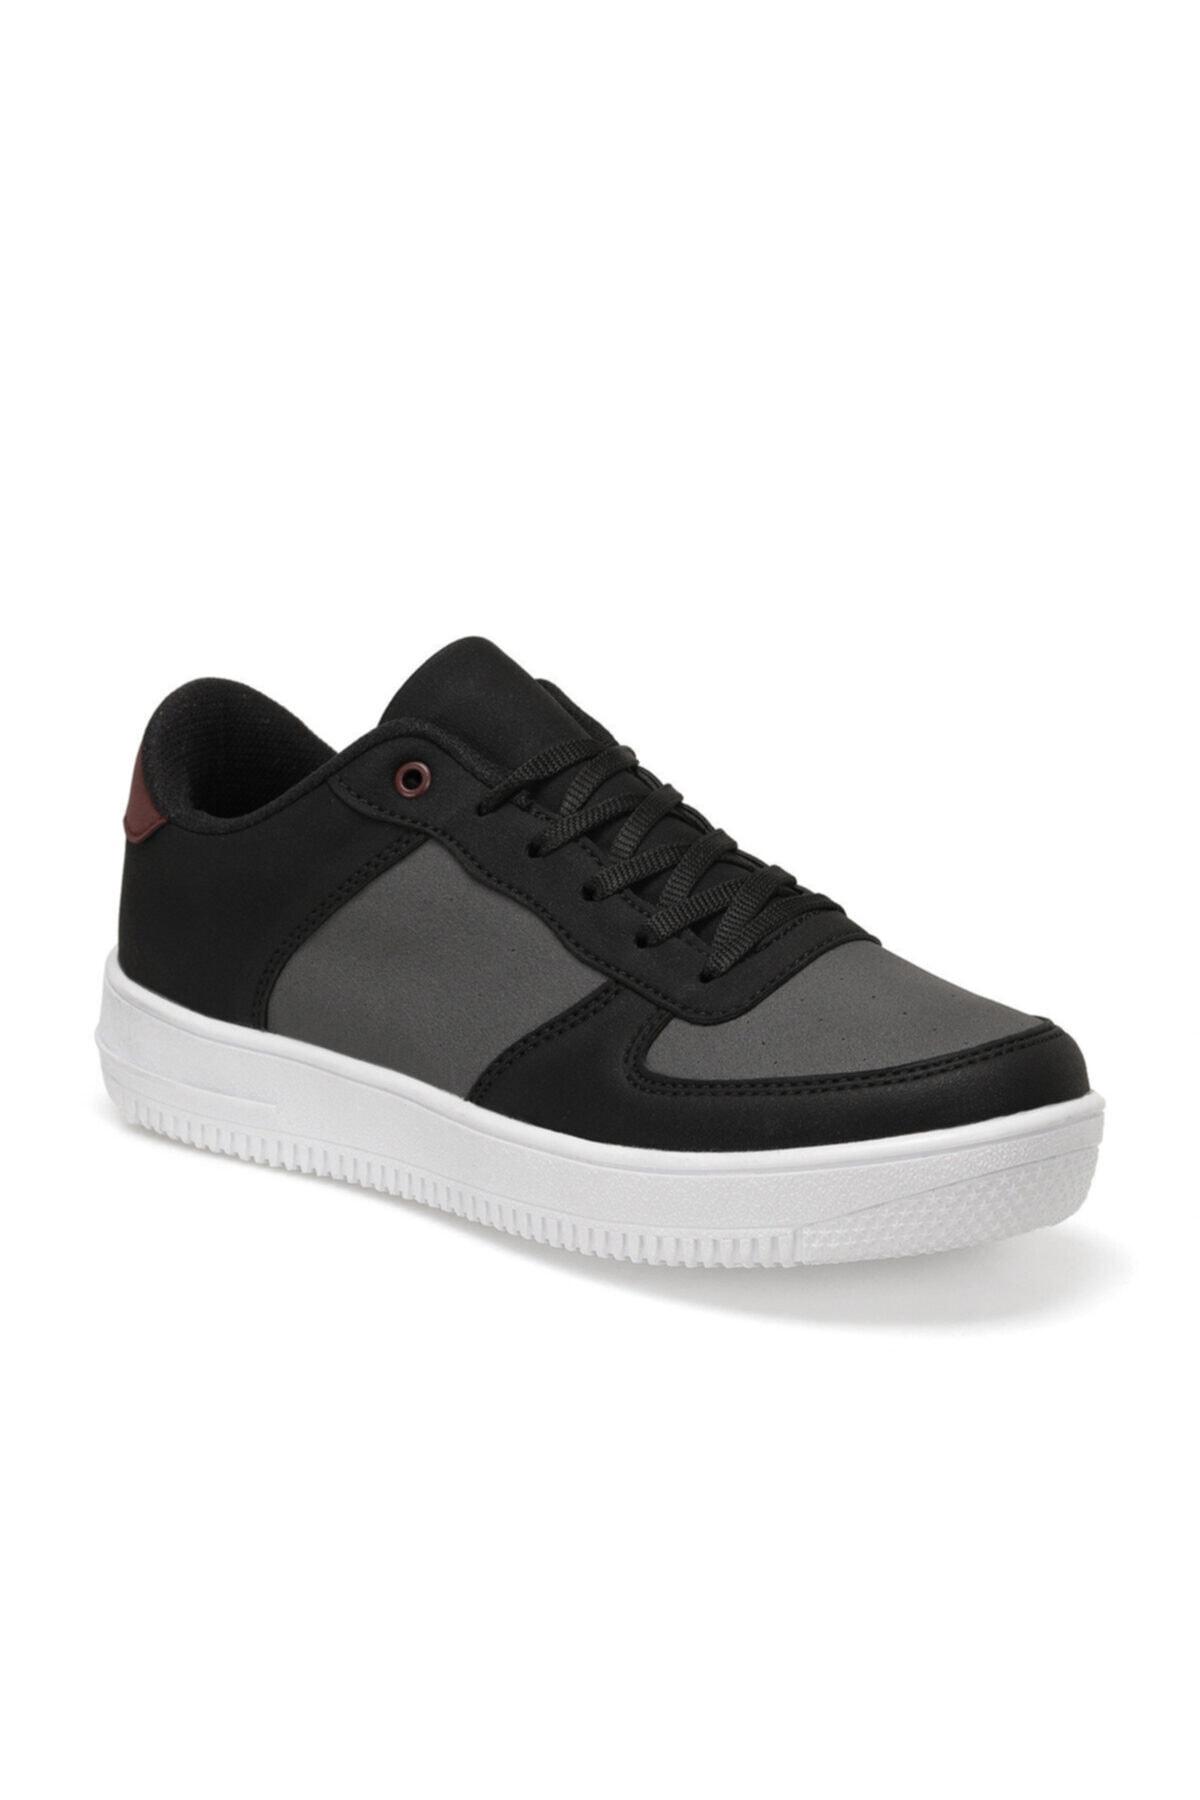 Torex DRAKE Gri Erkek Sneaker Ayakkabı 100576856 1